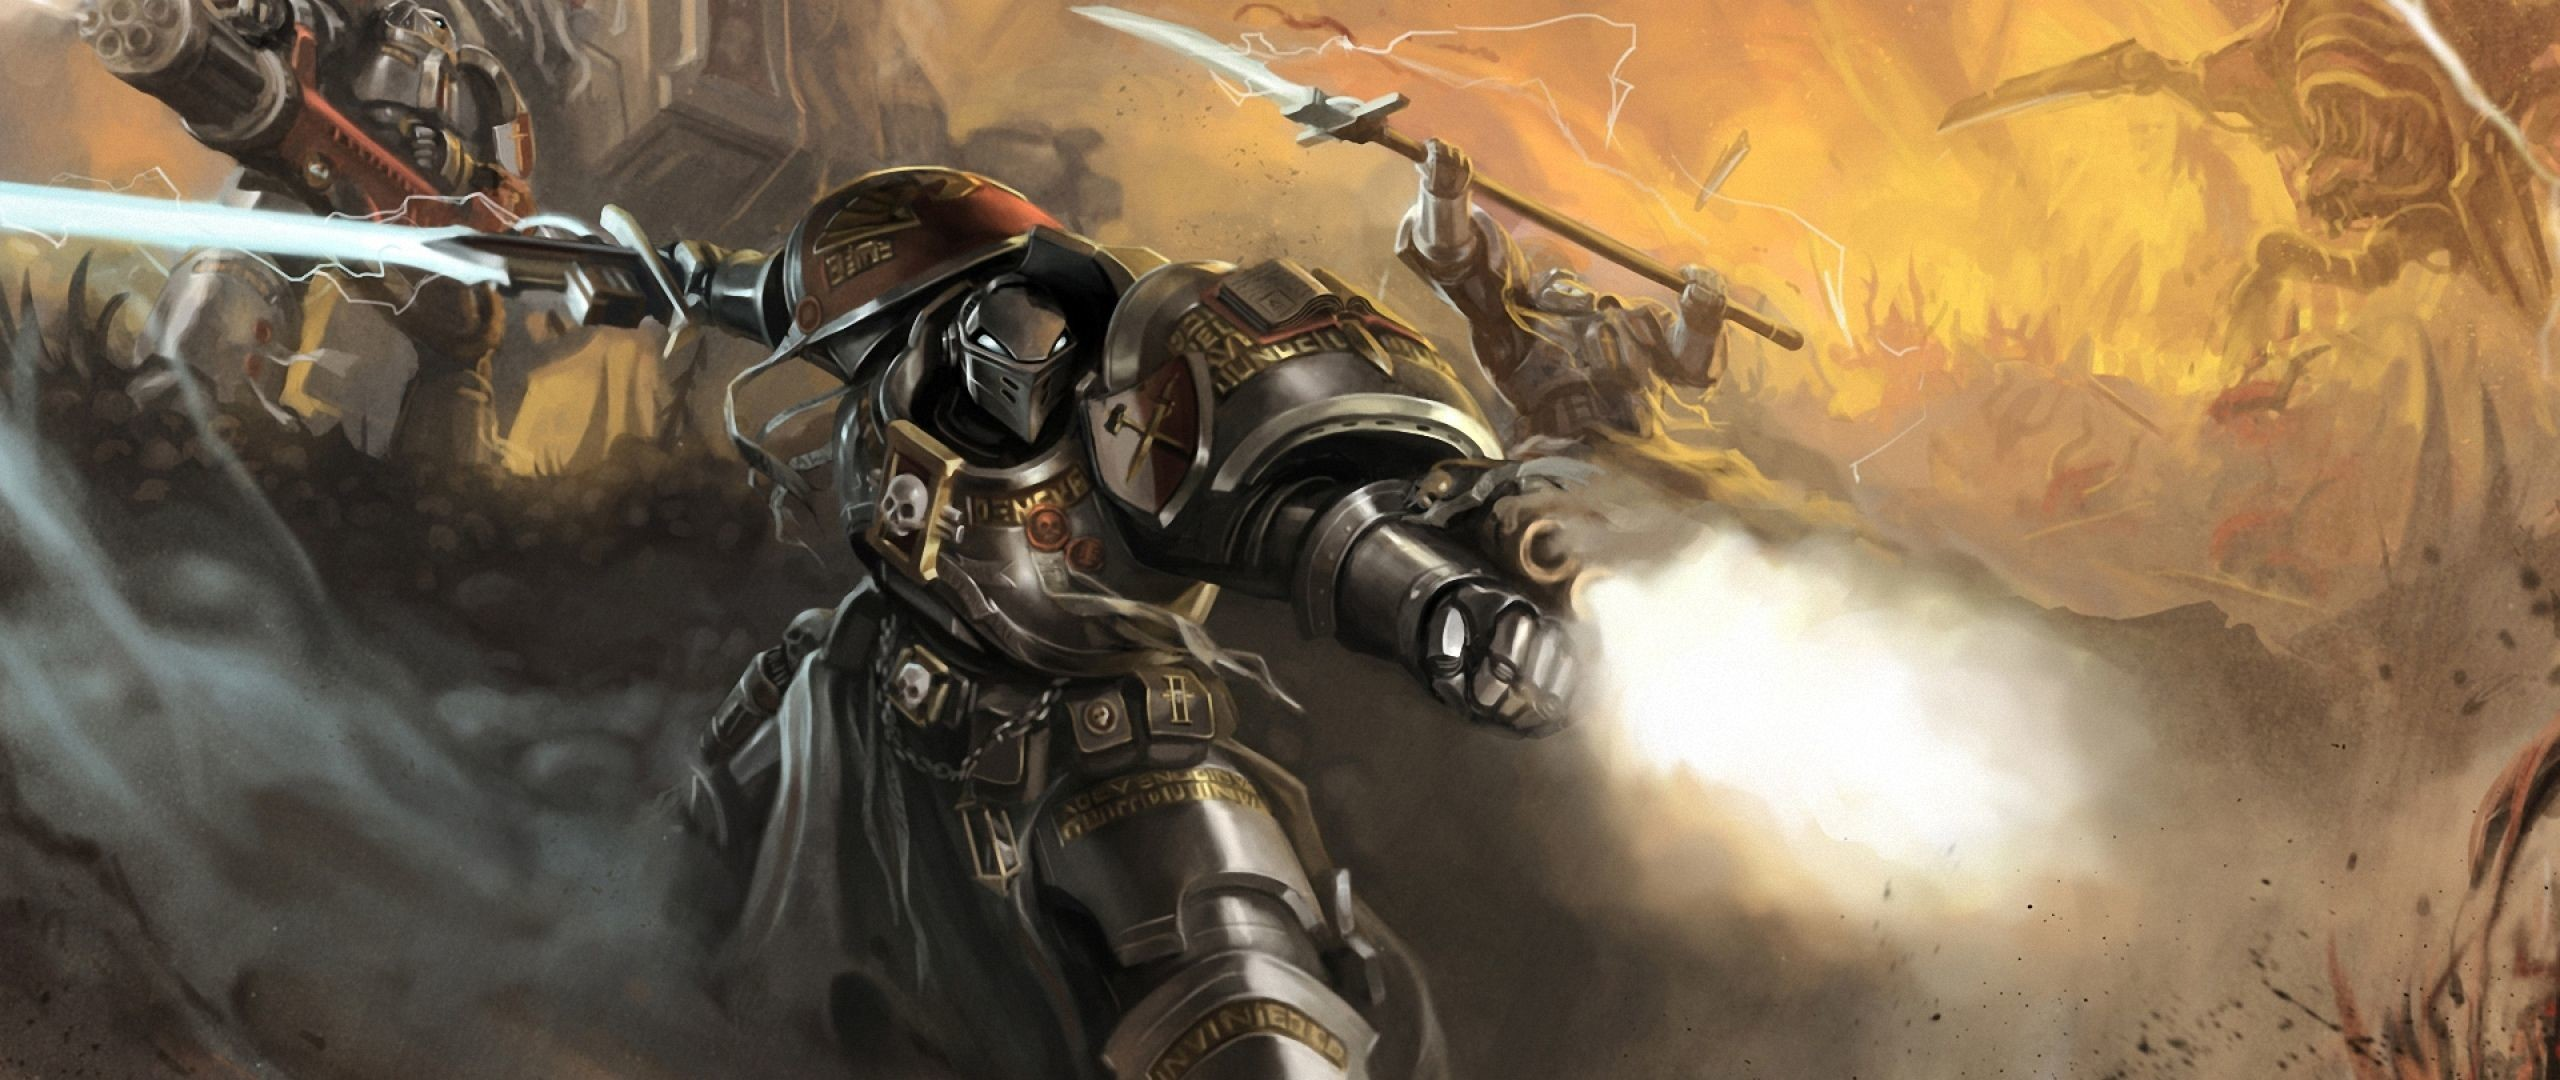 21:9 TV Warhammer 40k Wallpapers HD, Desktop Backgrounds .